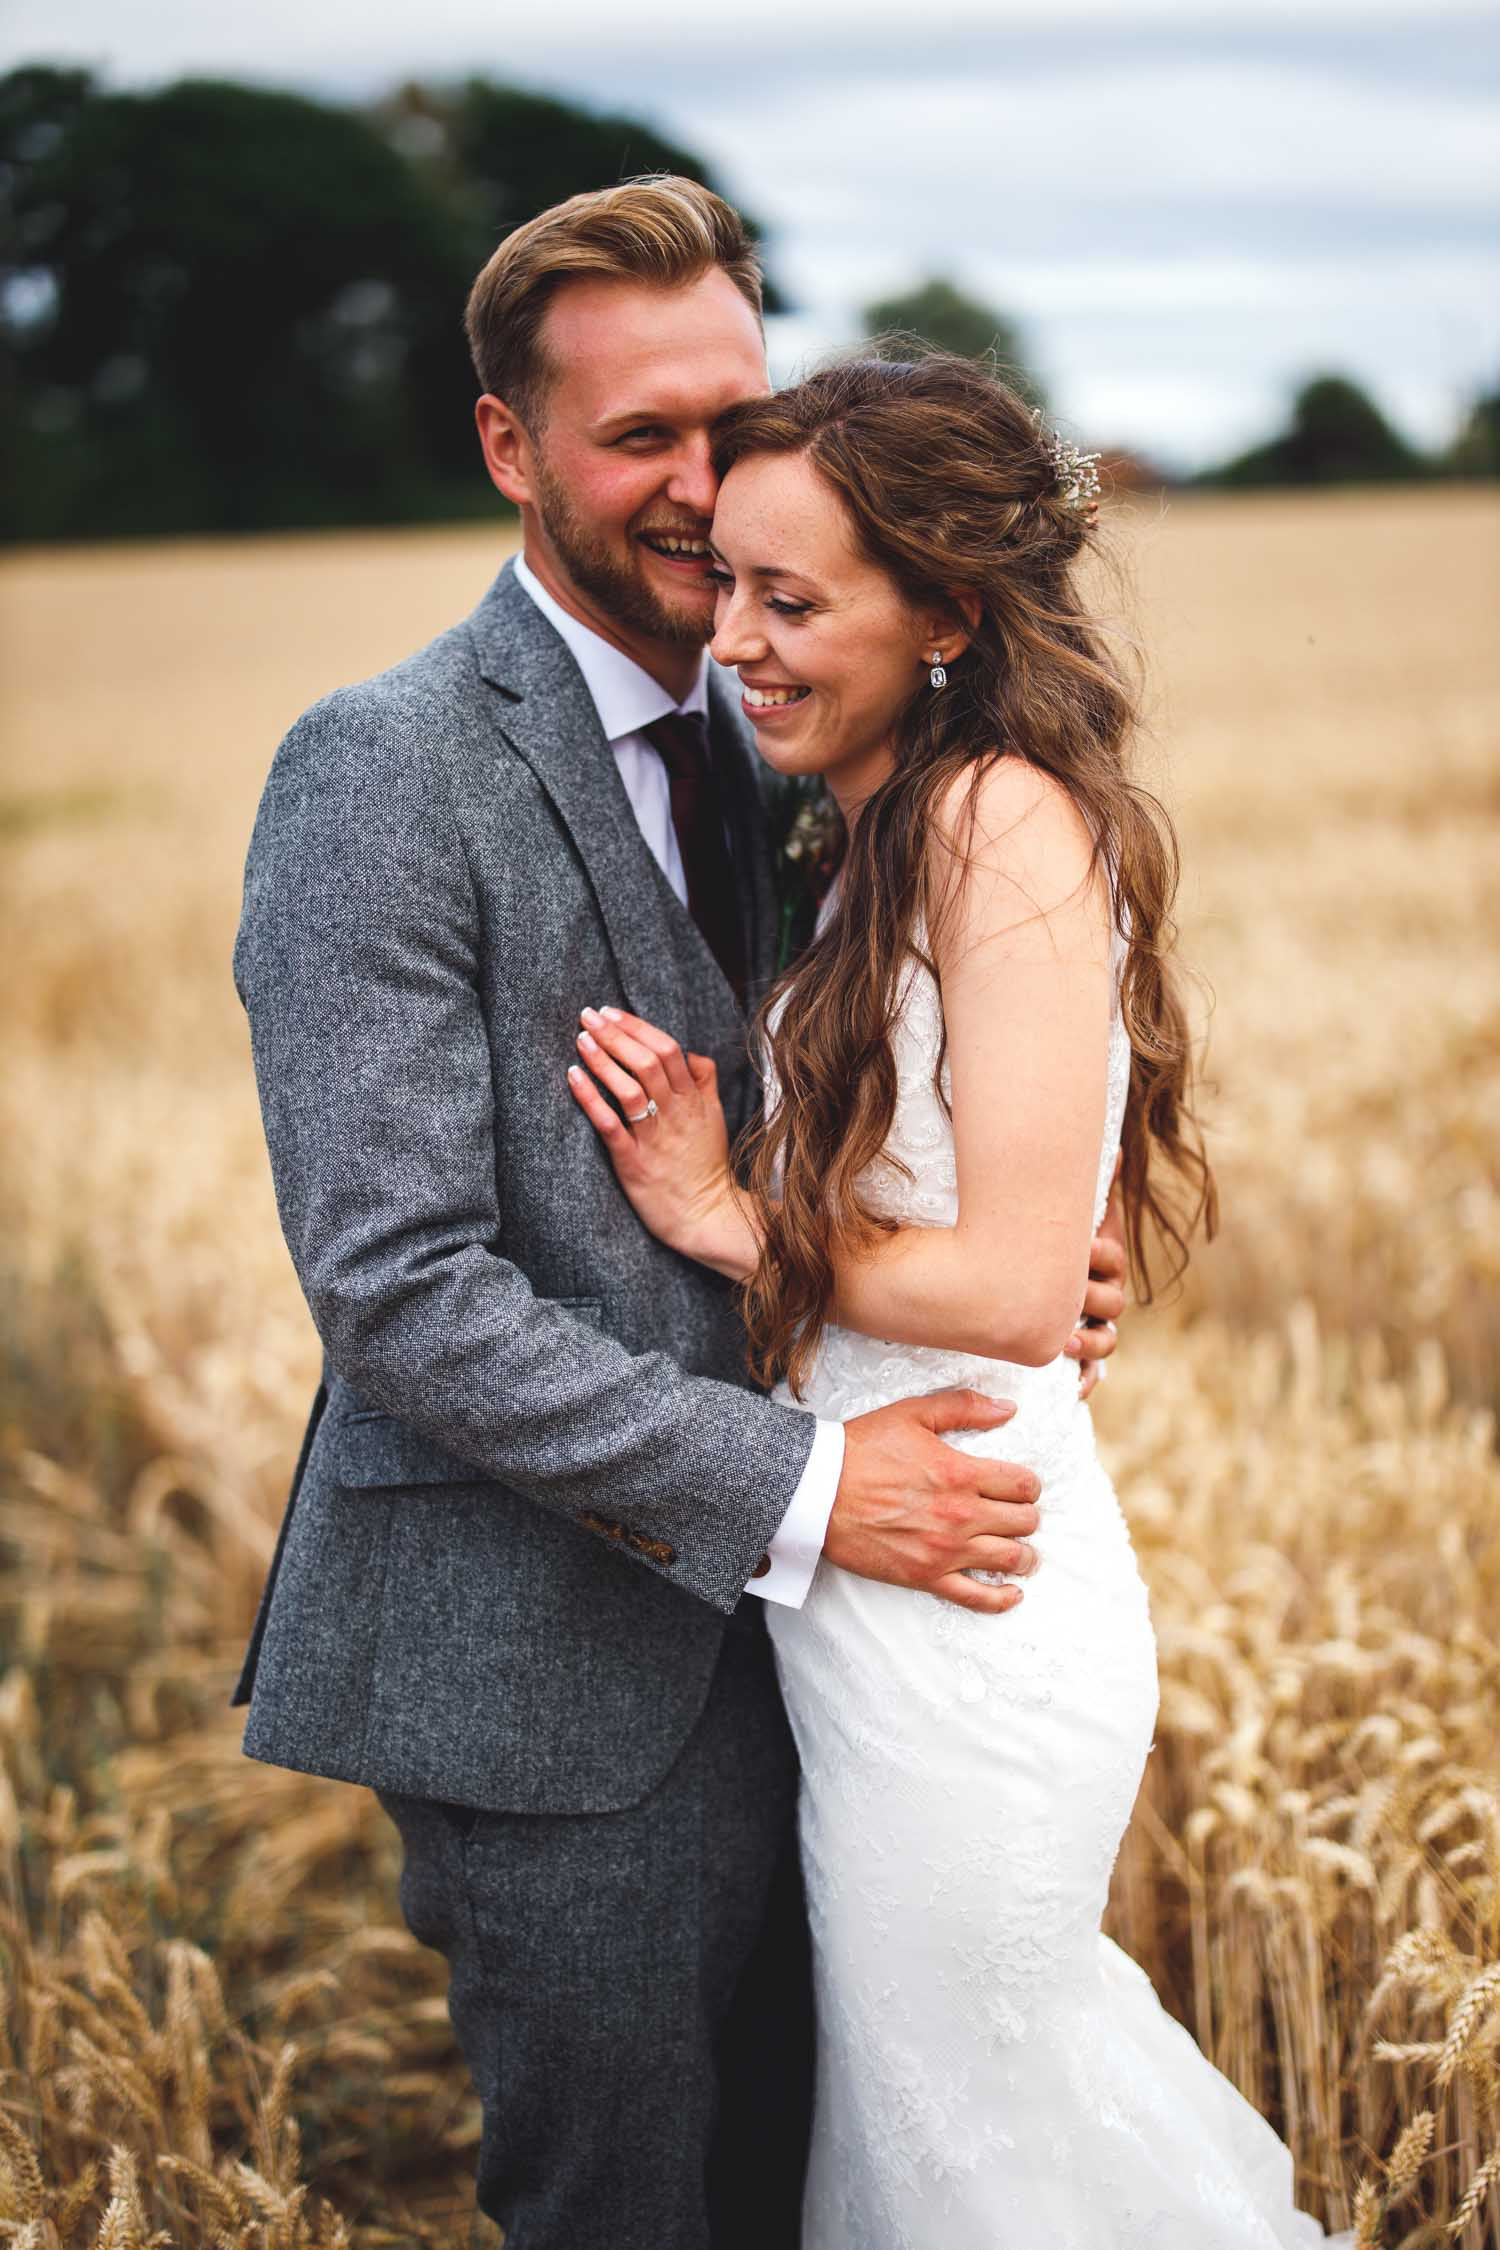 Herefordshire Wedding Photography, Wedding Photographer in Herefordshire, Westmidlands wedding photographer, Wedding, Photographer, Herefordshire